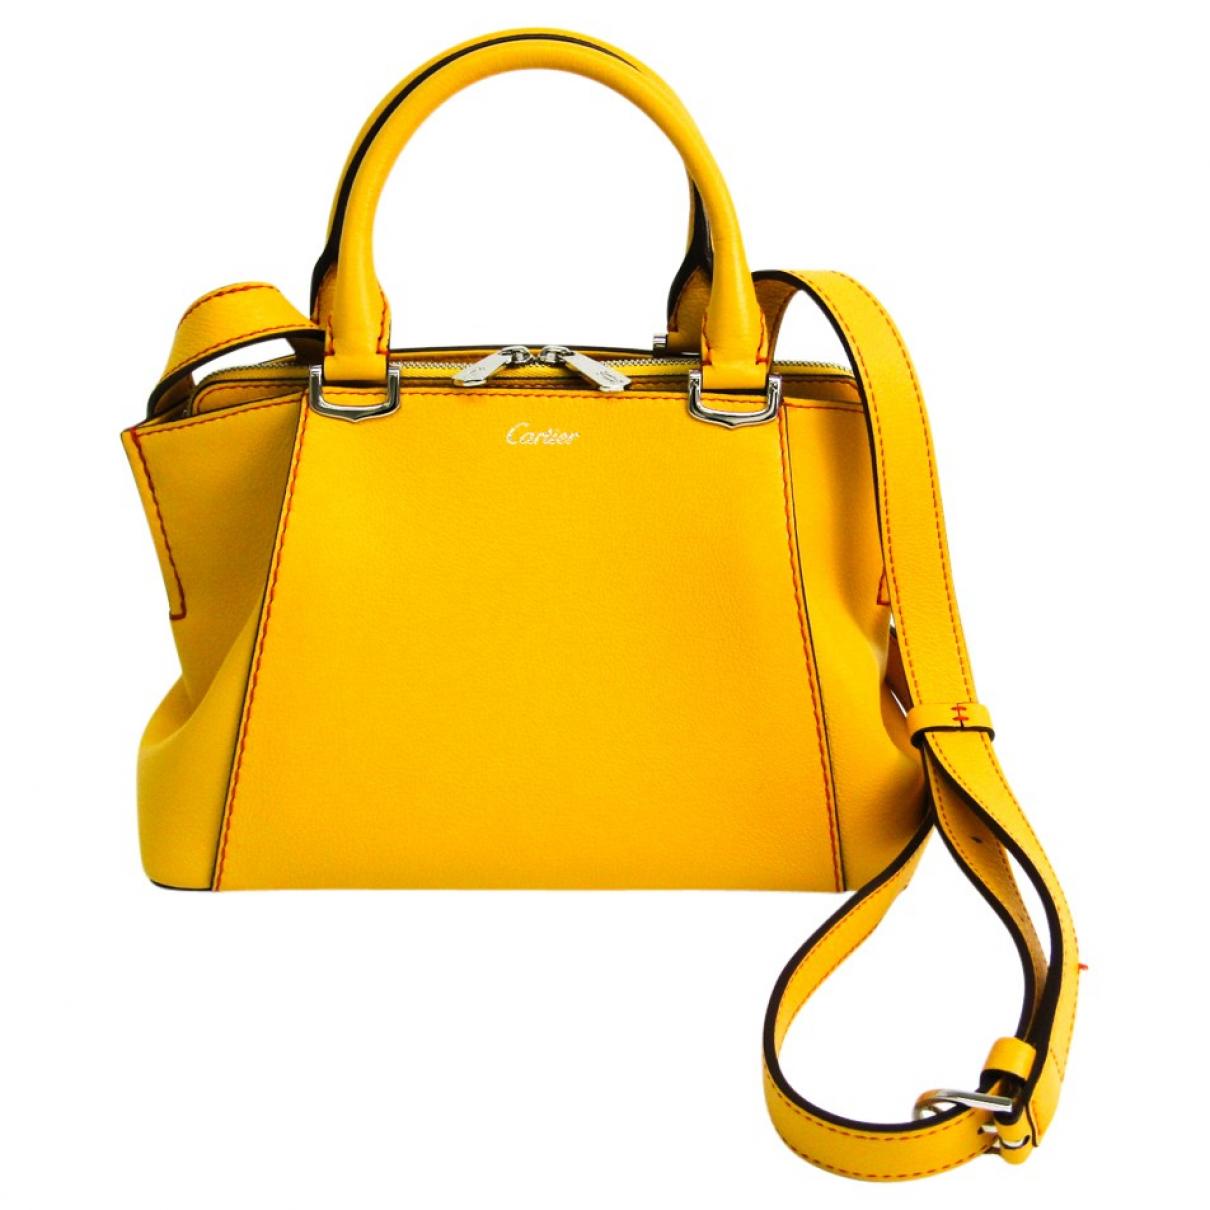 Cartier \N Yellow Leather handbag for Women \N